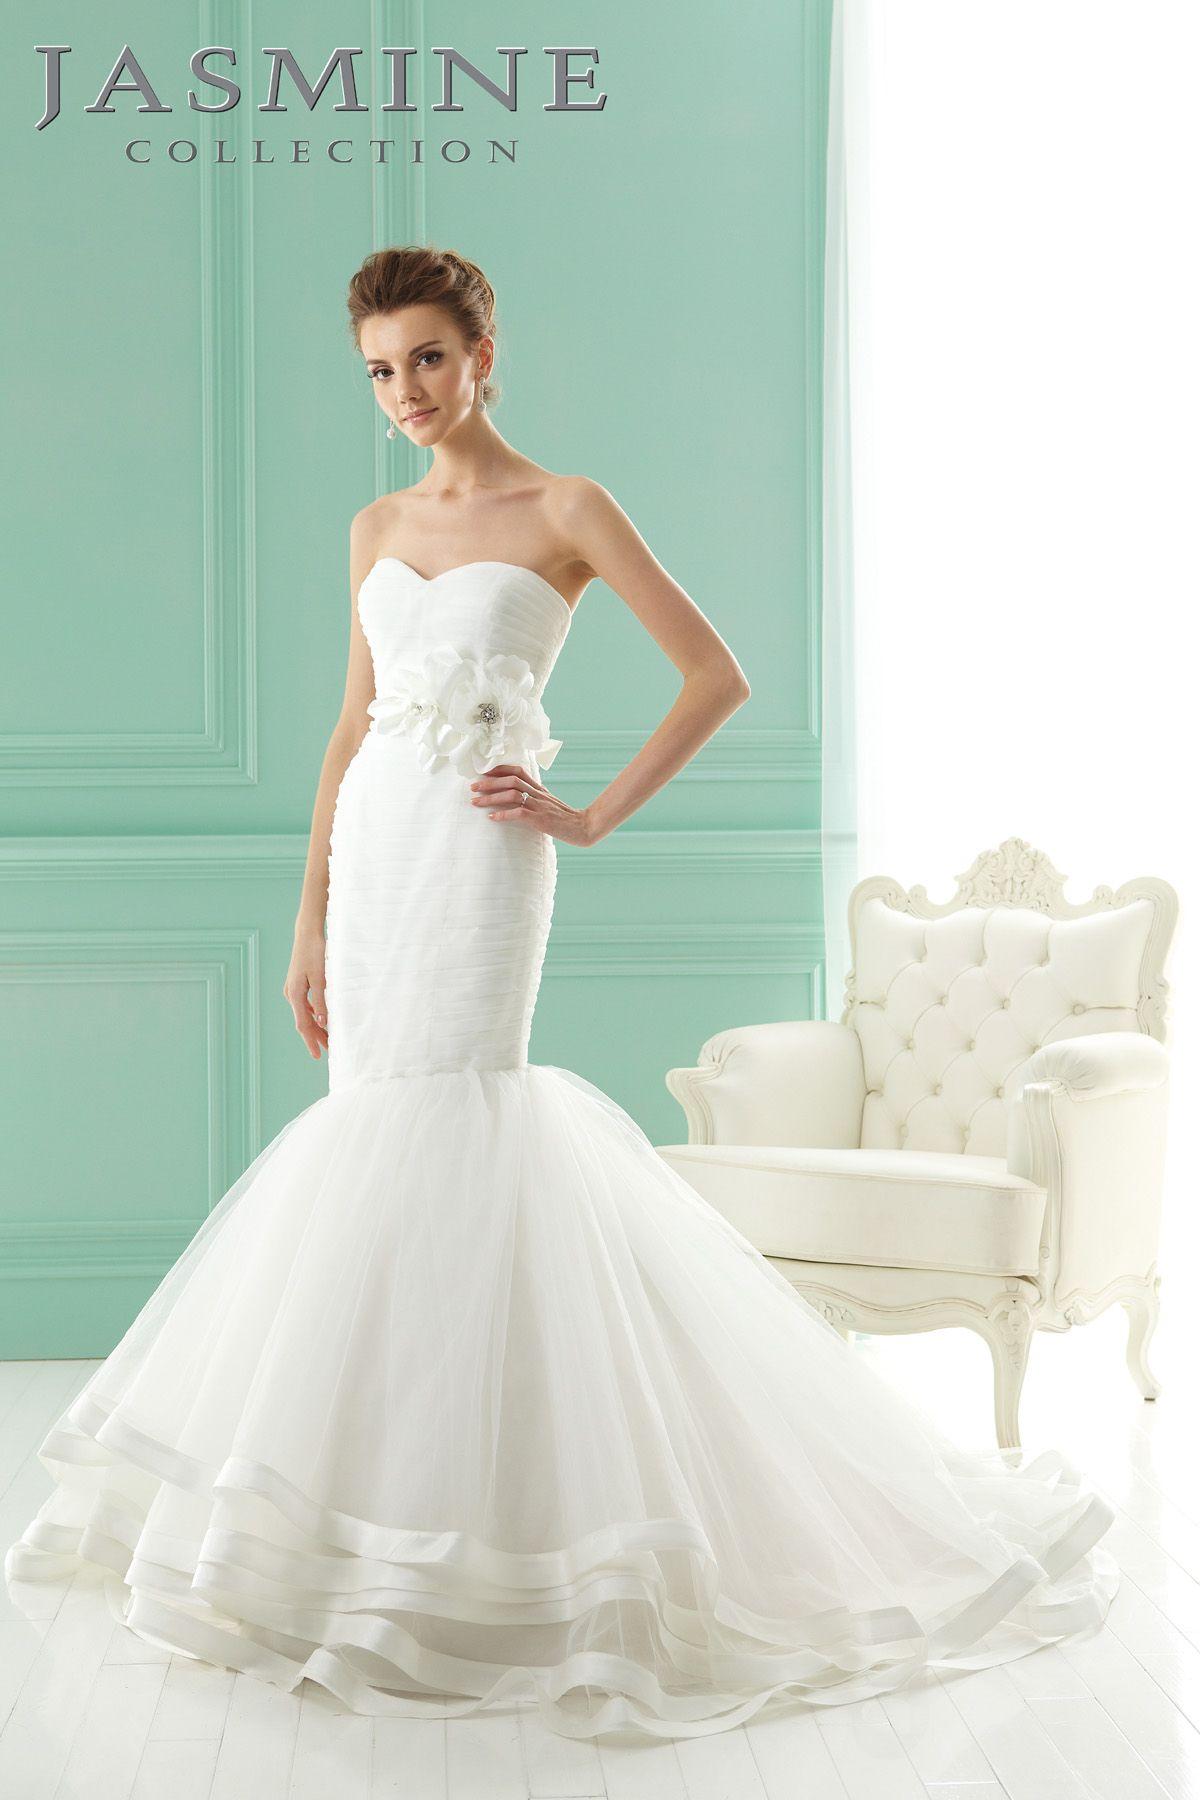 Jasmine Bridal @ Ten Fashions Bridal Boutique. www.tenfashions.com ...